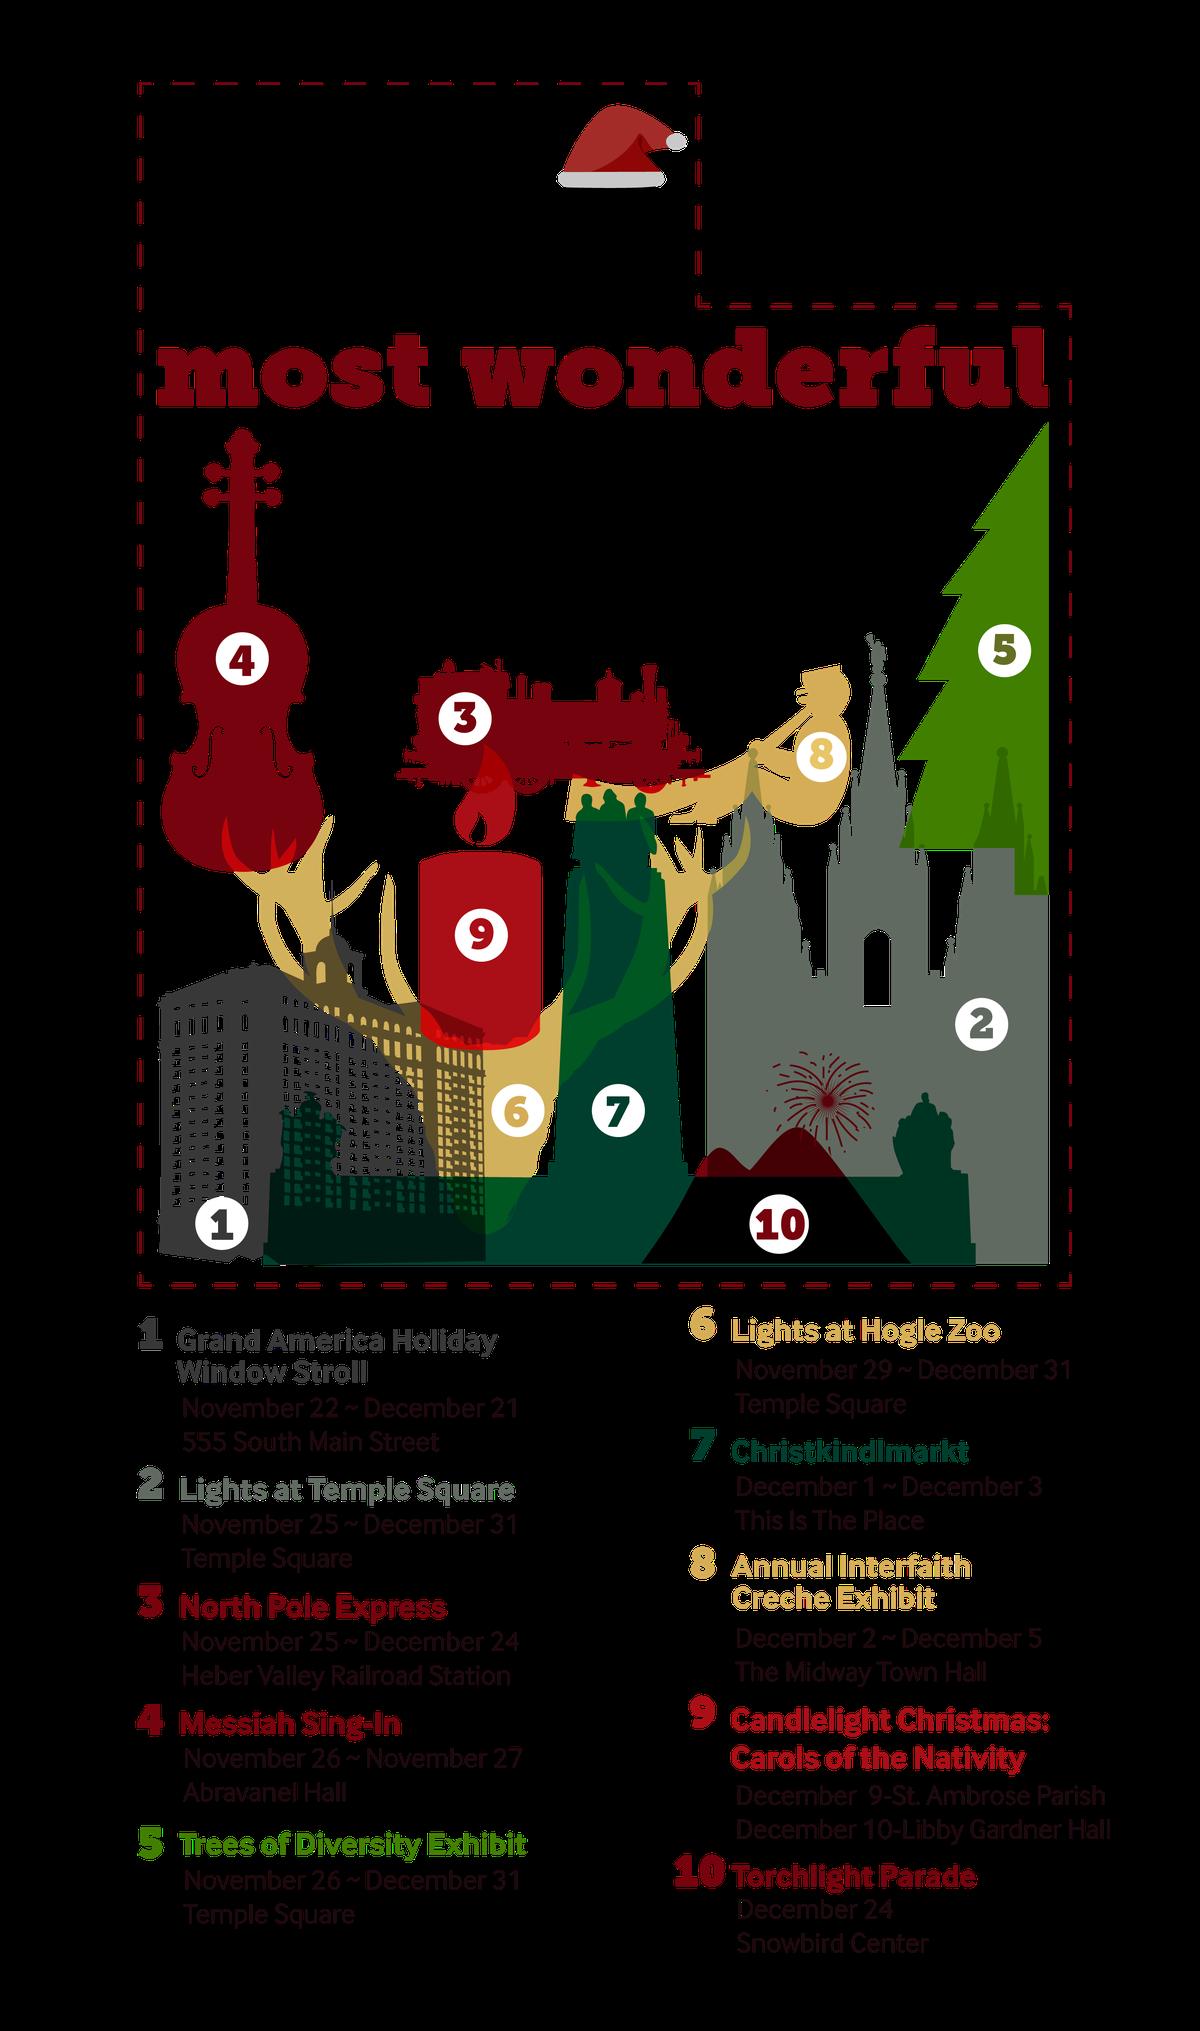 Christmas Activities In Utah.10 Family Christmas Activities In Northern Utah Deseret News